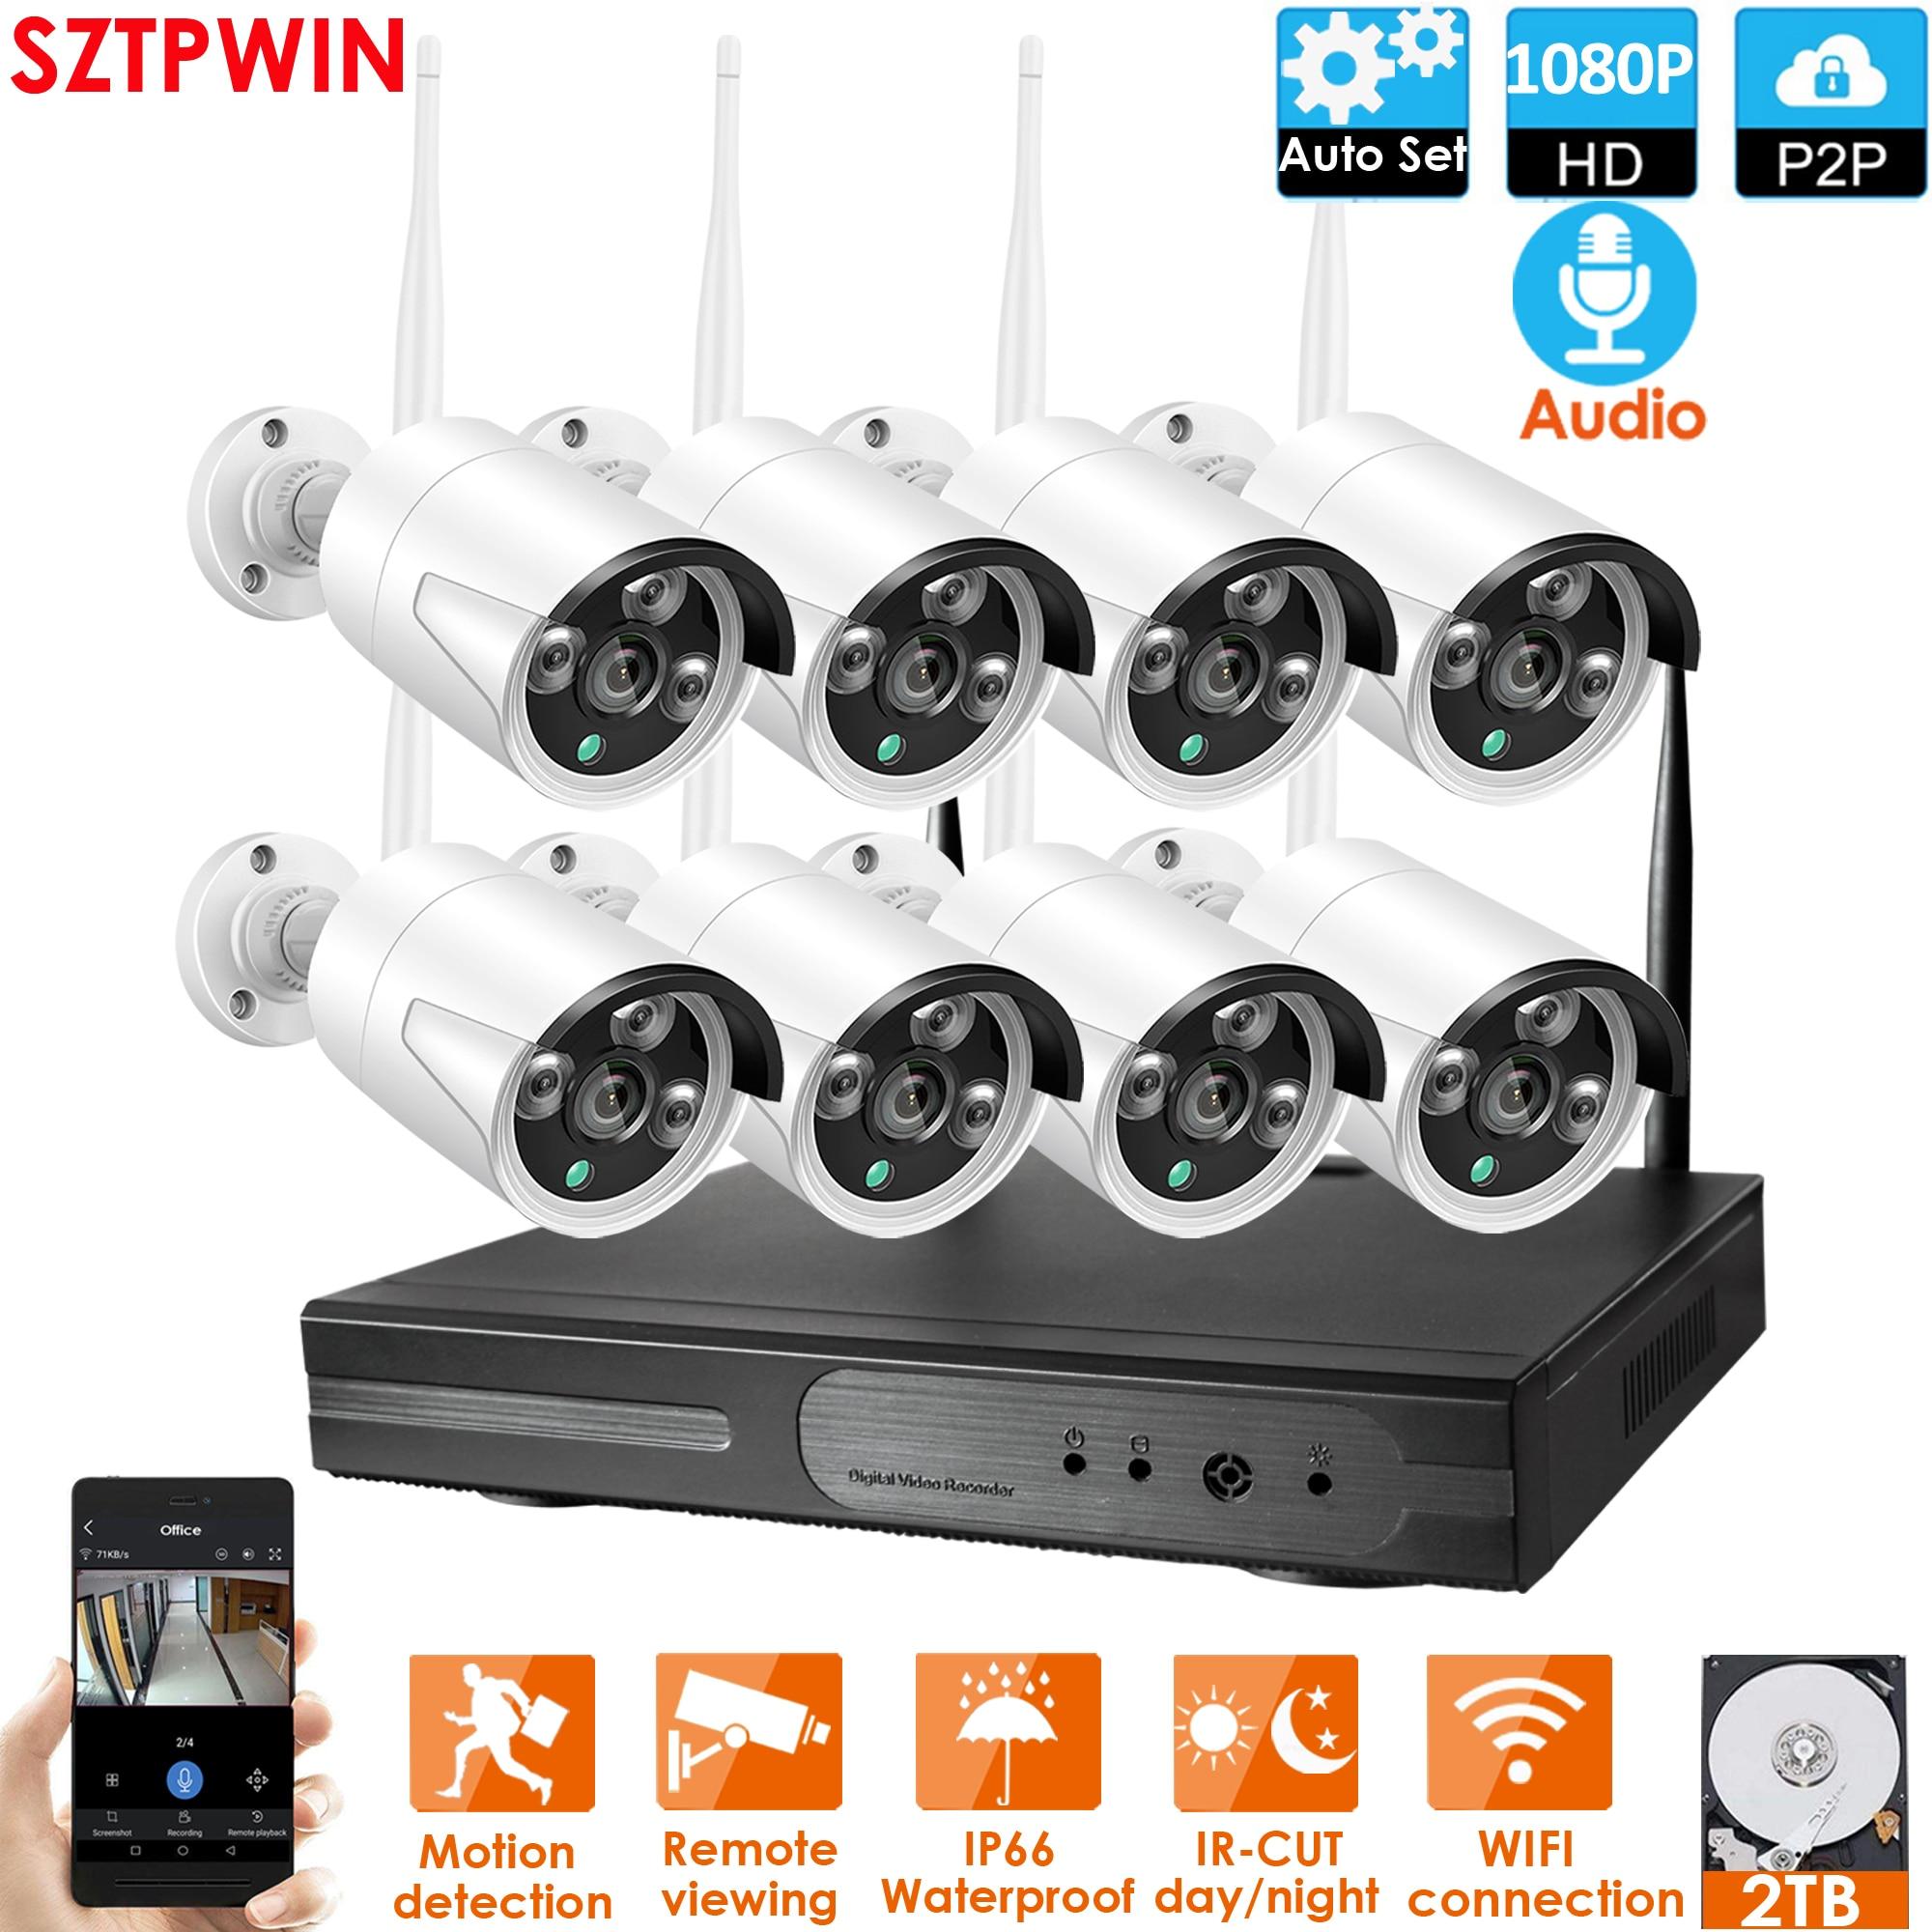 Plughplay 8CH 1080P Audio inalámbrico NVR Kit P2P1080P Interior Exterior visión nocturna seguridad 2,0 MPaudio IP Cámara WIFI sistema CCTV